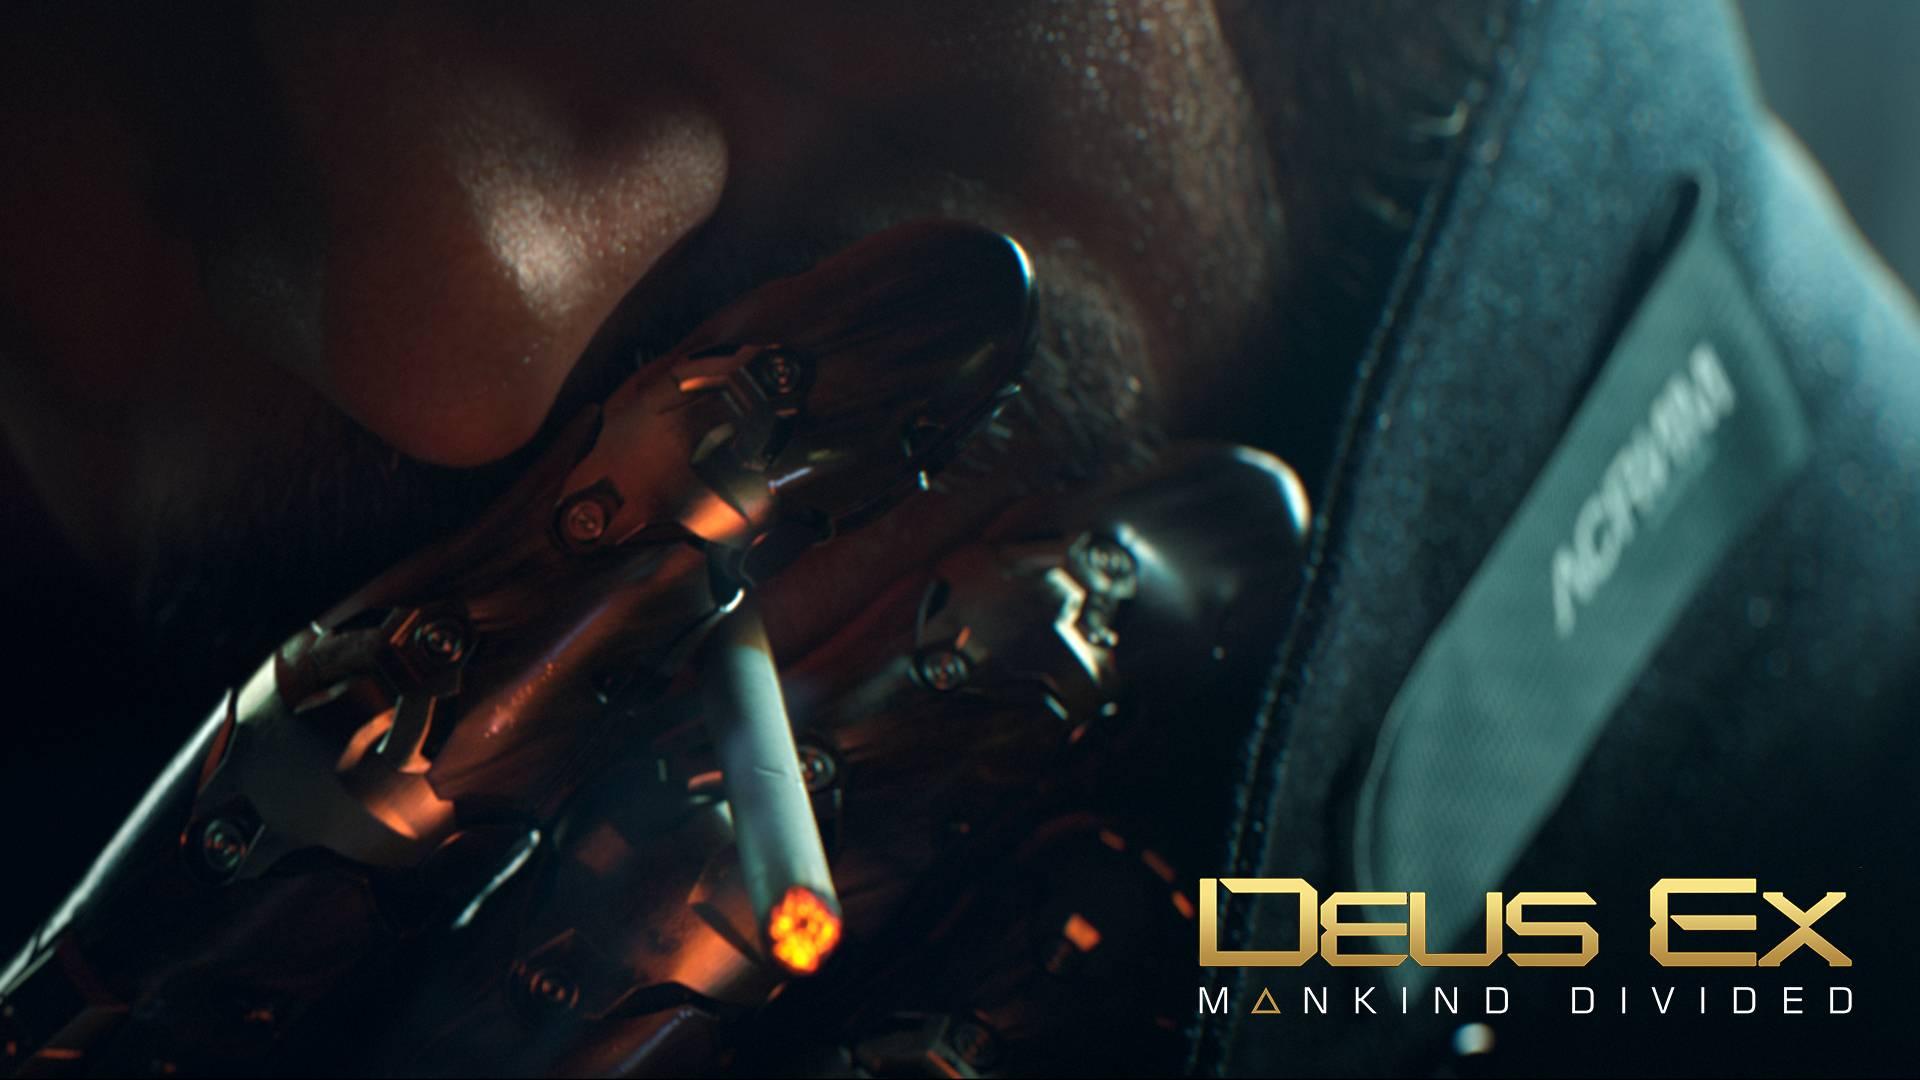 Deus Ex Mankind Divided Hd Wallpaper Background Image